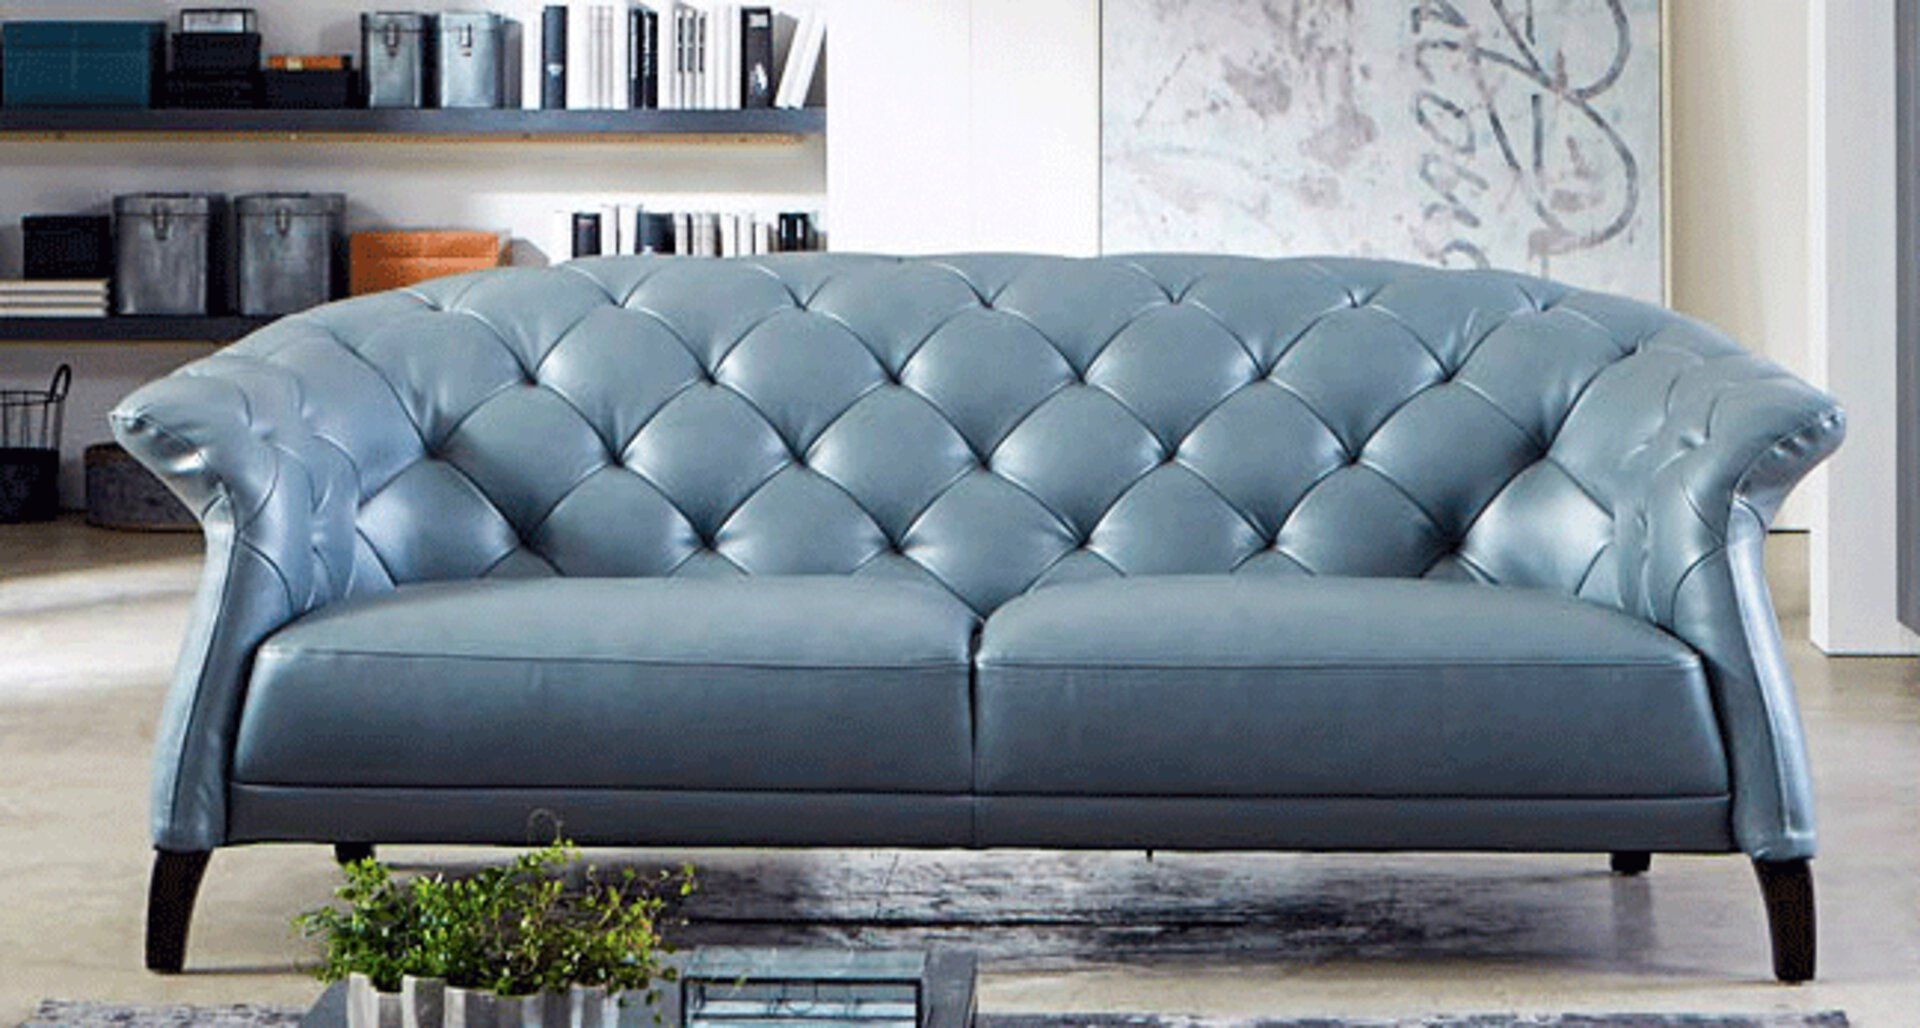 Sofa 3,5-Sitzer EX.007 CELECT Leder 99 x 81 x 256 cm